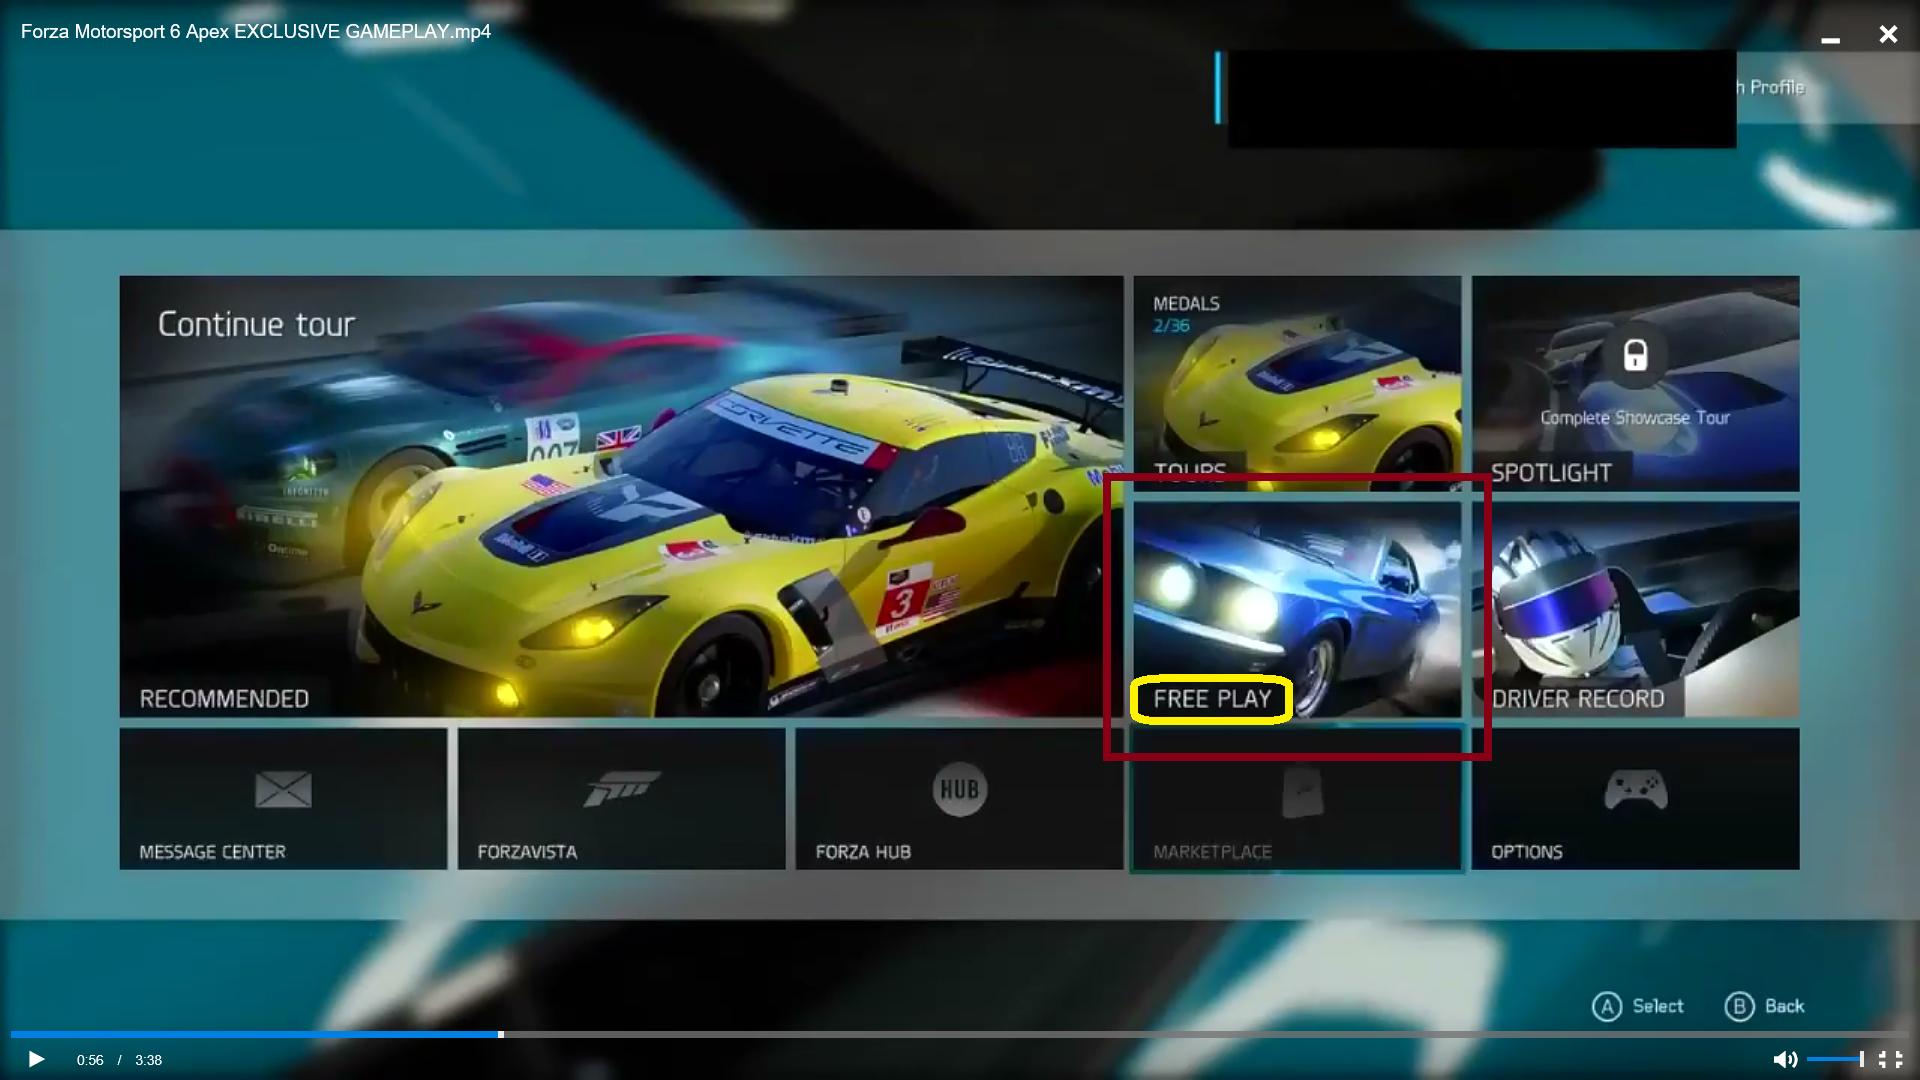 Forza Motorsport 6: Apex  - Изображение 1